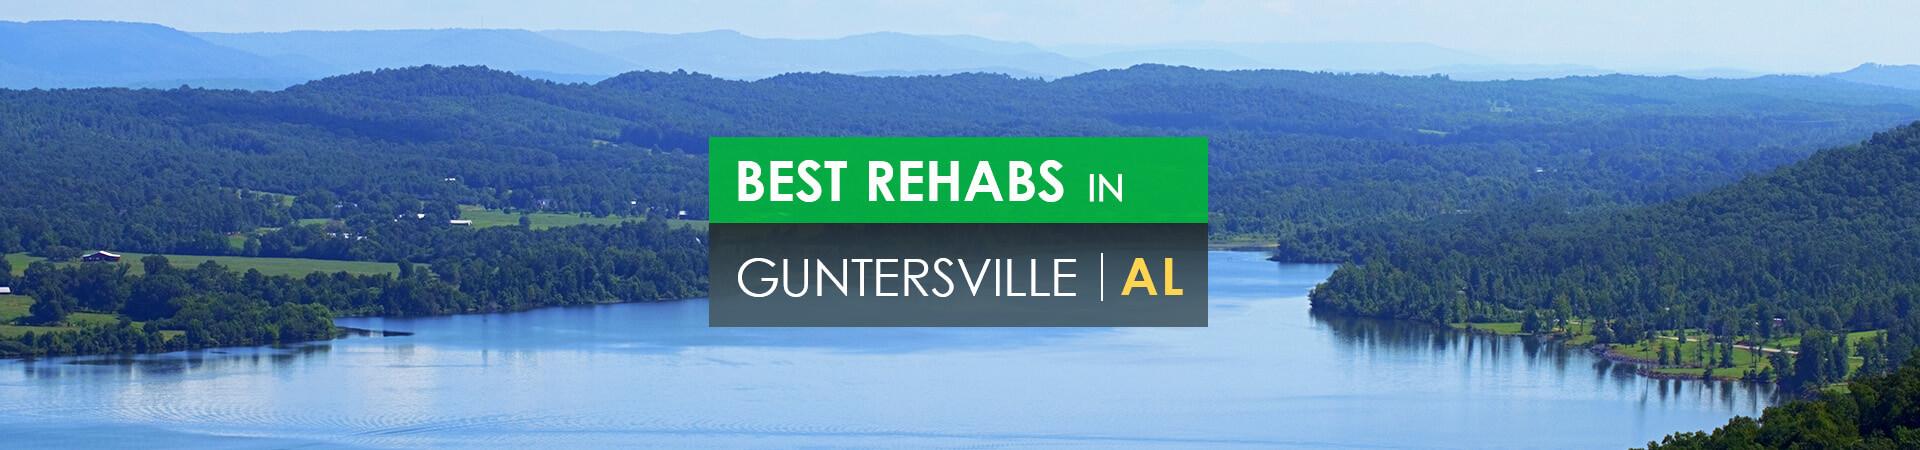 Best rehabs in Guntersville, AL